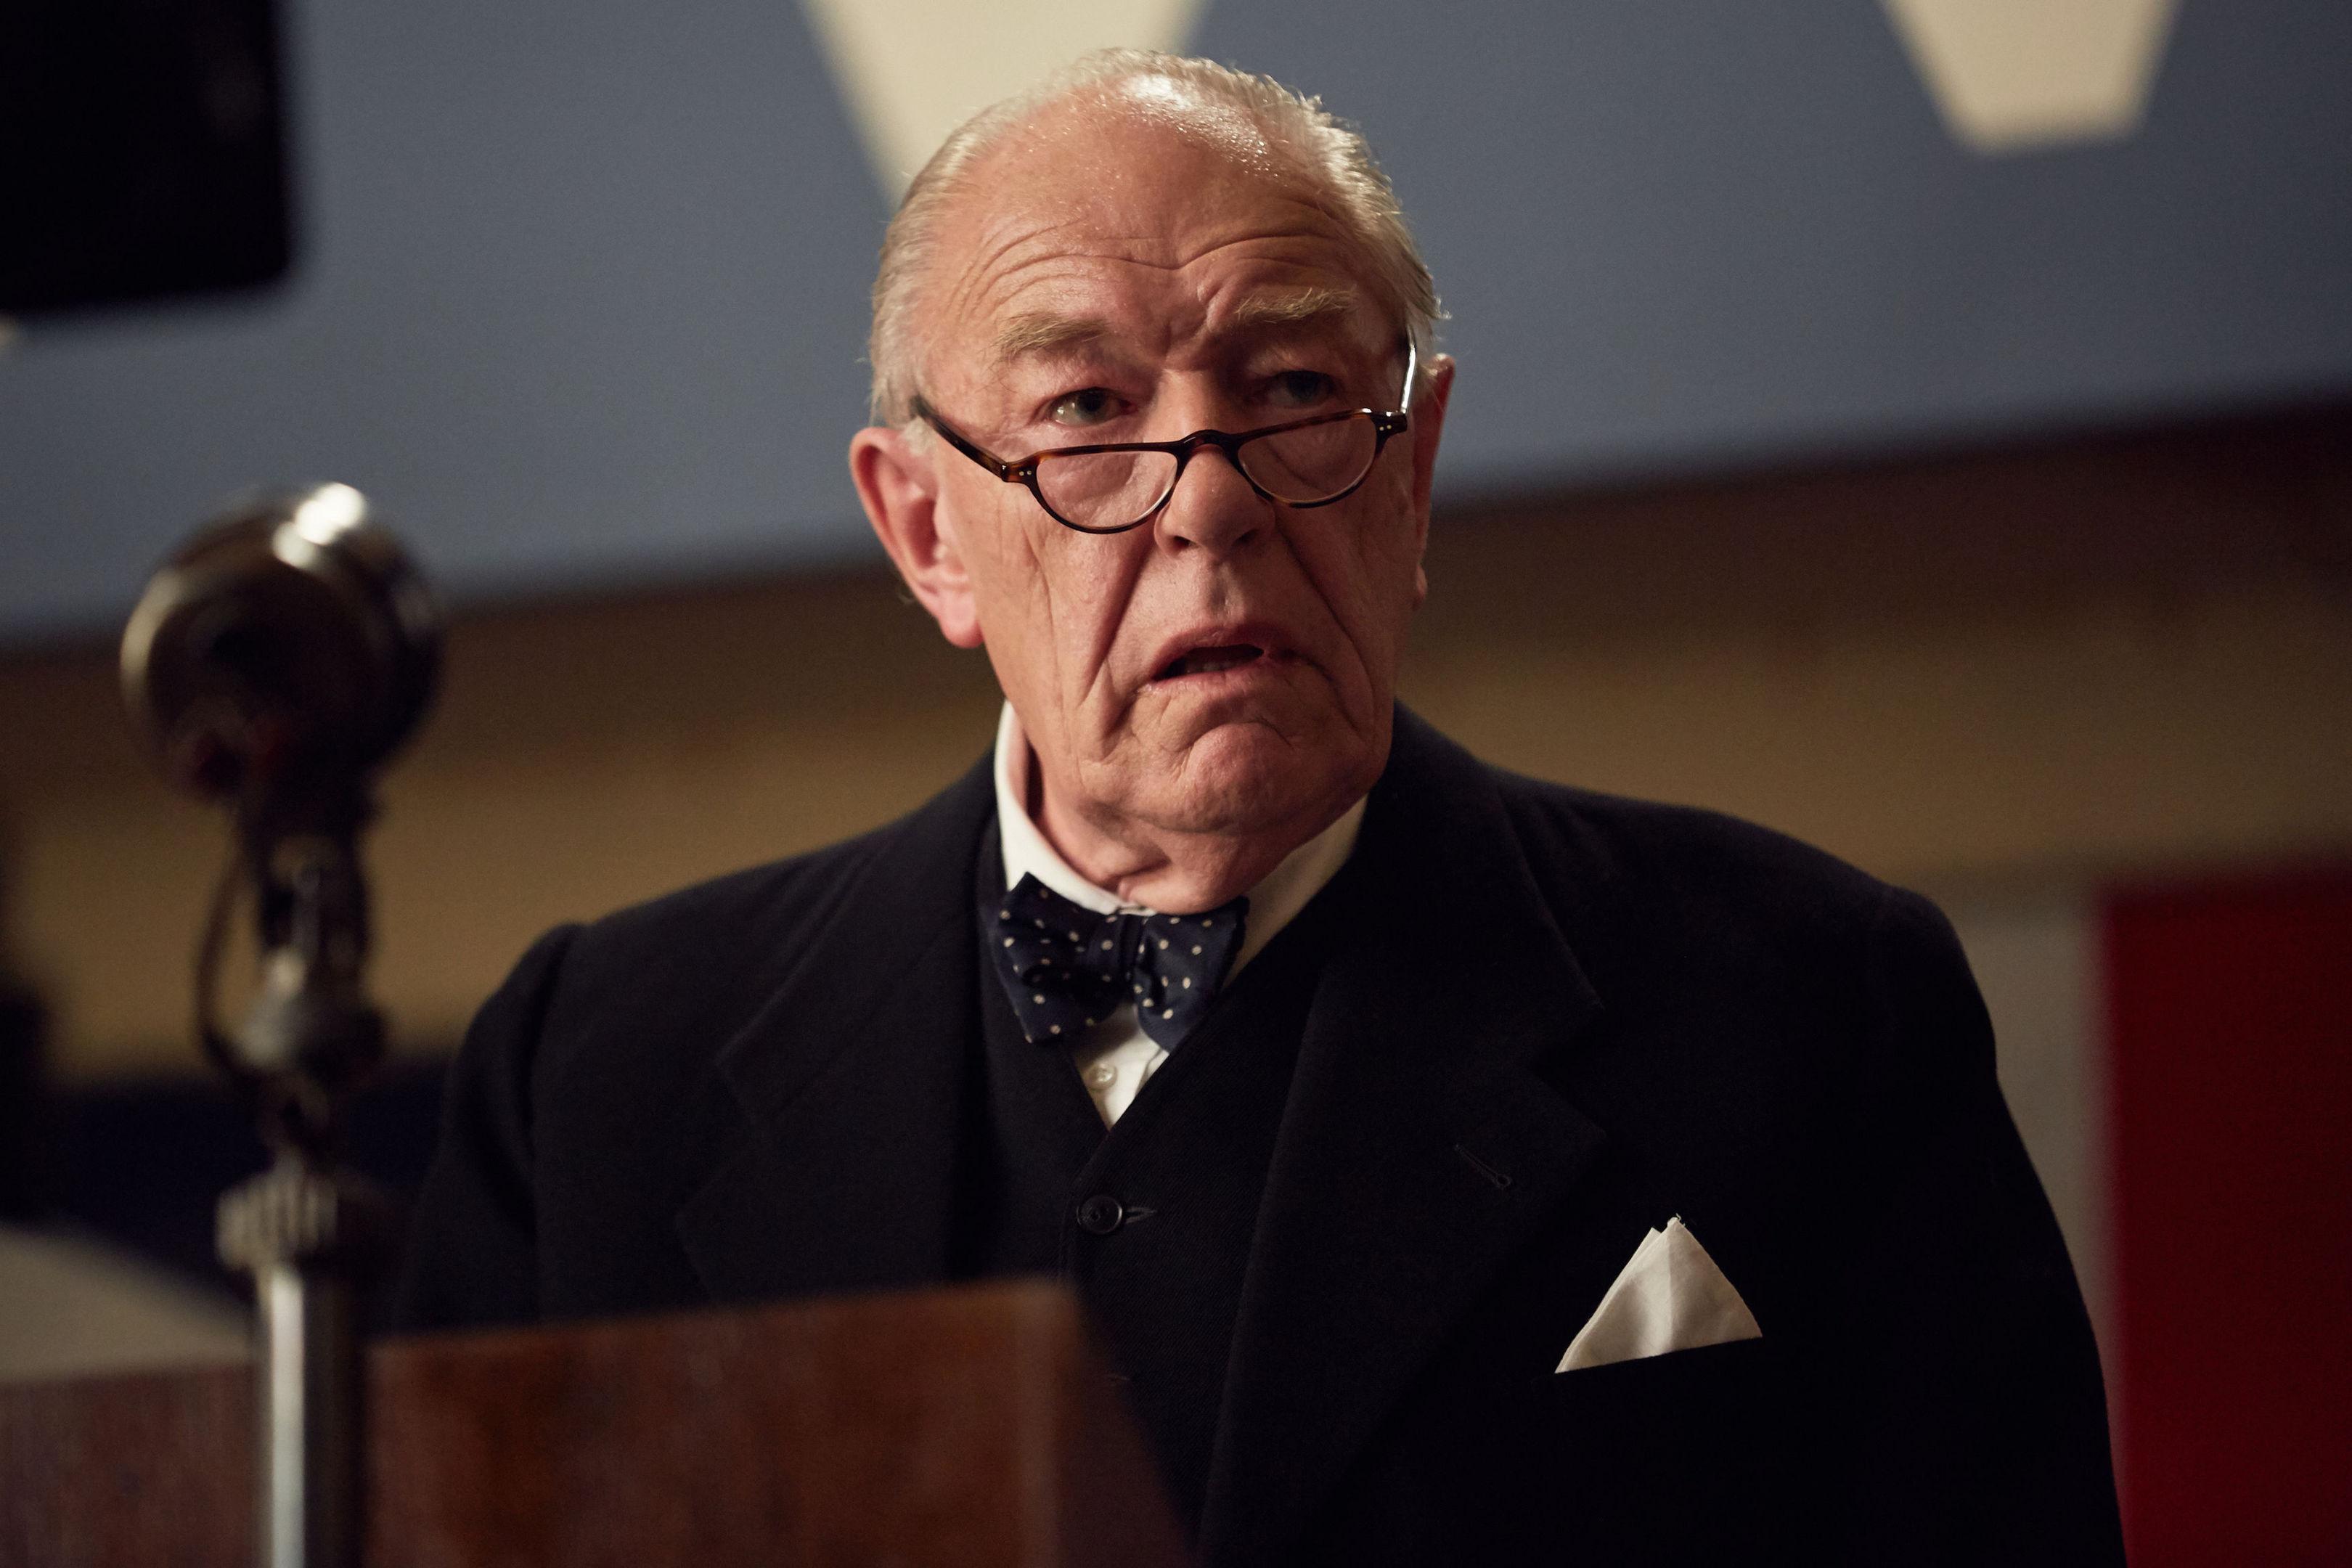 Gambon as Winston Churchill (ITV/ROBERT VIGLASKY/Daybreak)